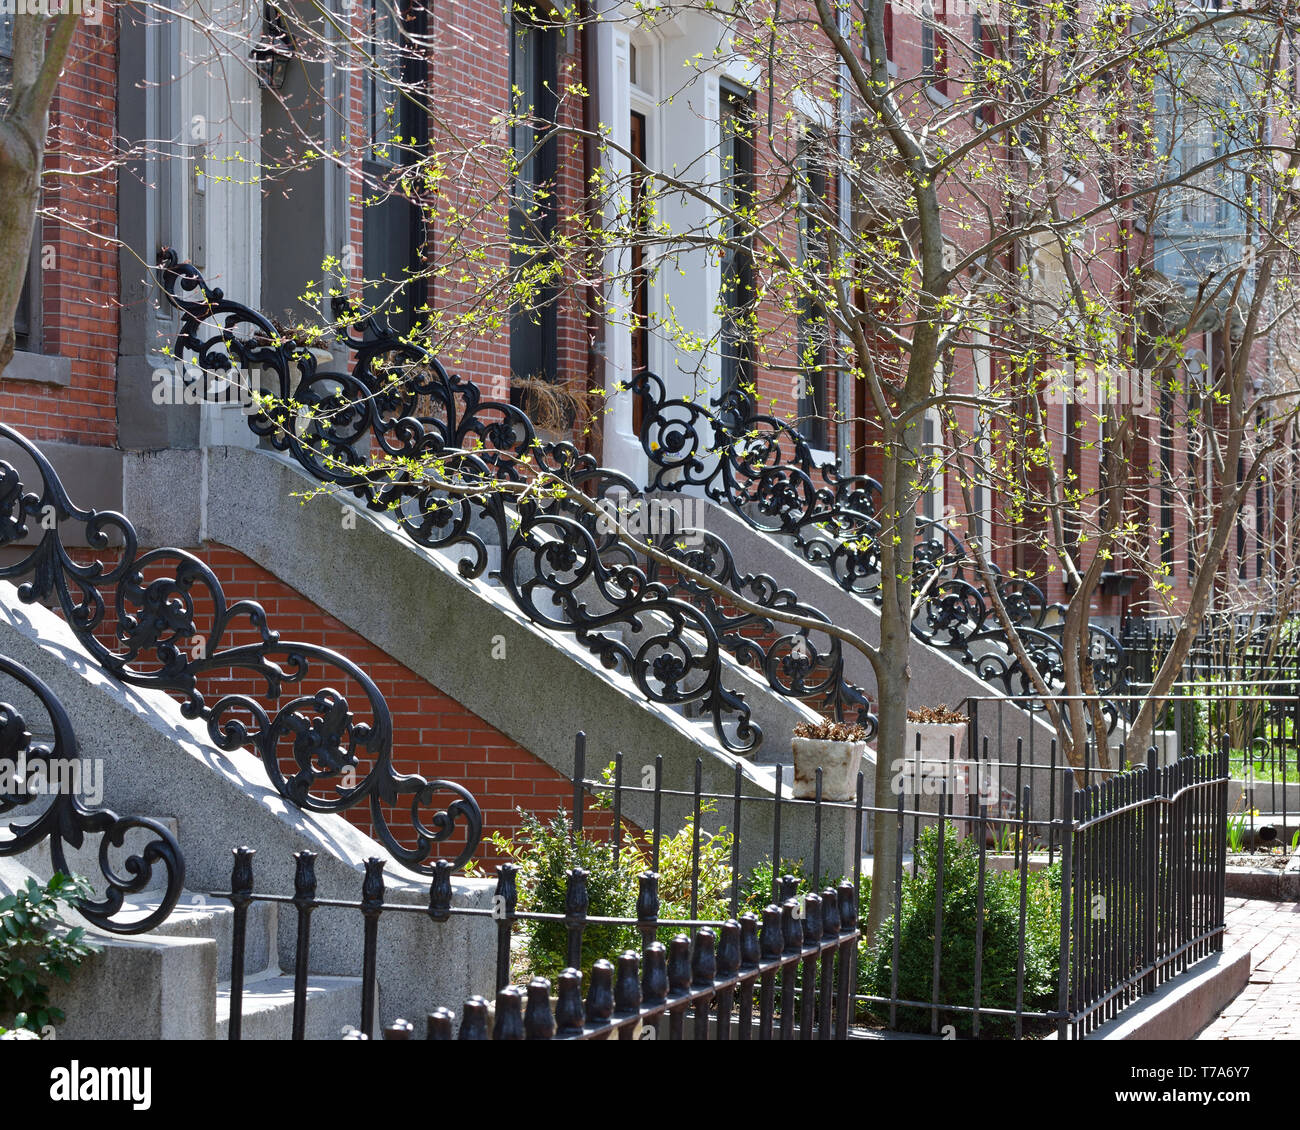 Elegant cast iron railings in Boston South End. Running rose pattern on decorative handrails, granite stone steps, brick facades, bright spring leaves - Stock Image